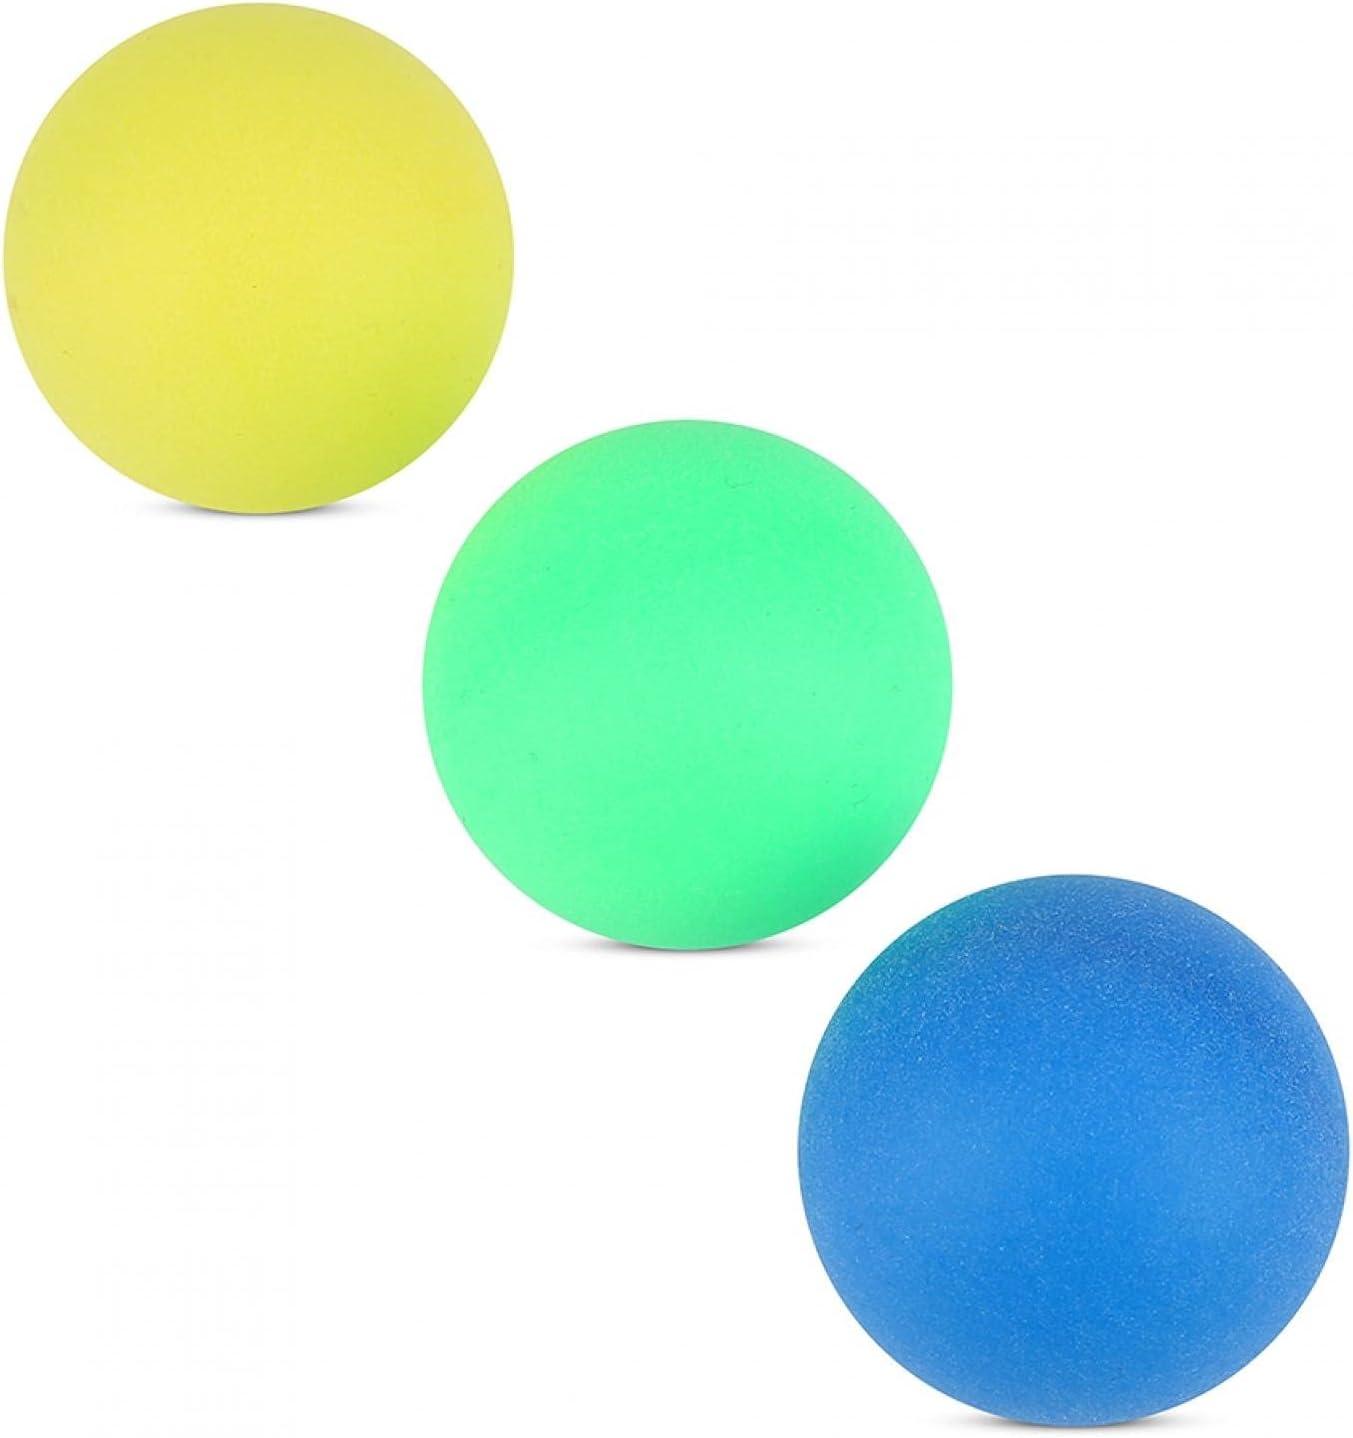 Hozee Colorful Balls, Pong Balls 60Pcs/Set Colorful Pong, Room D